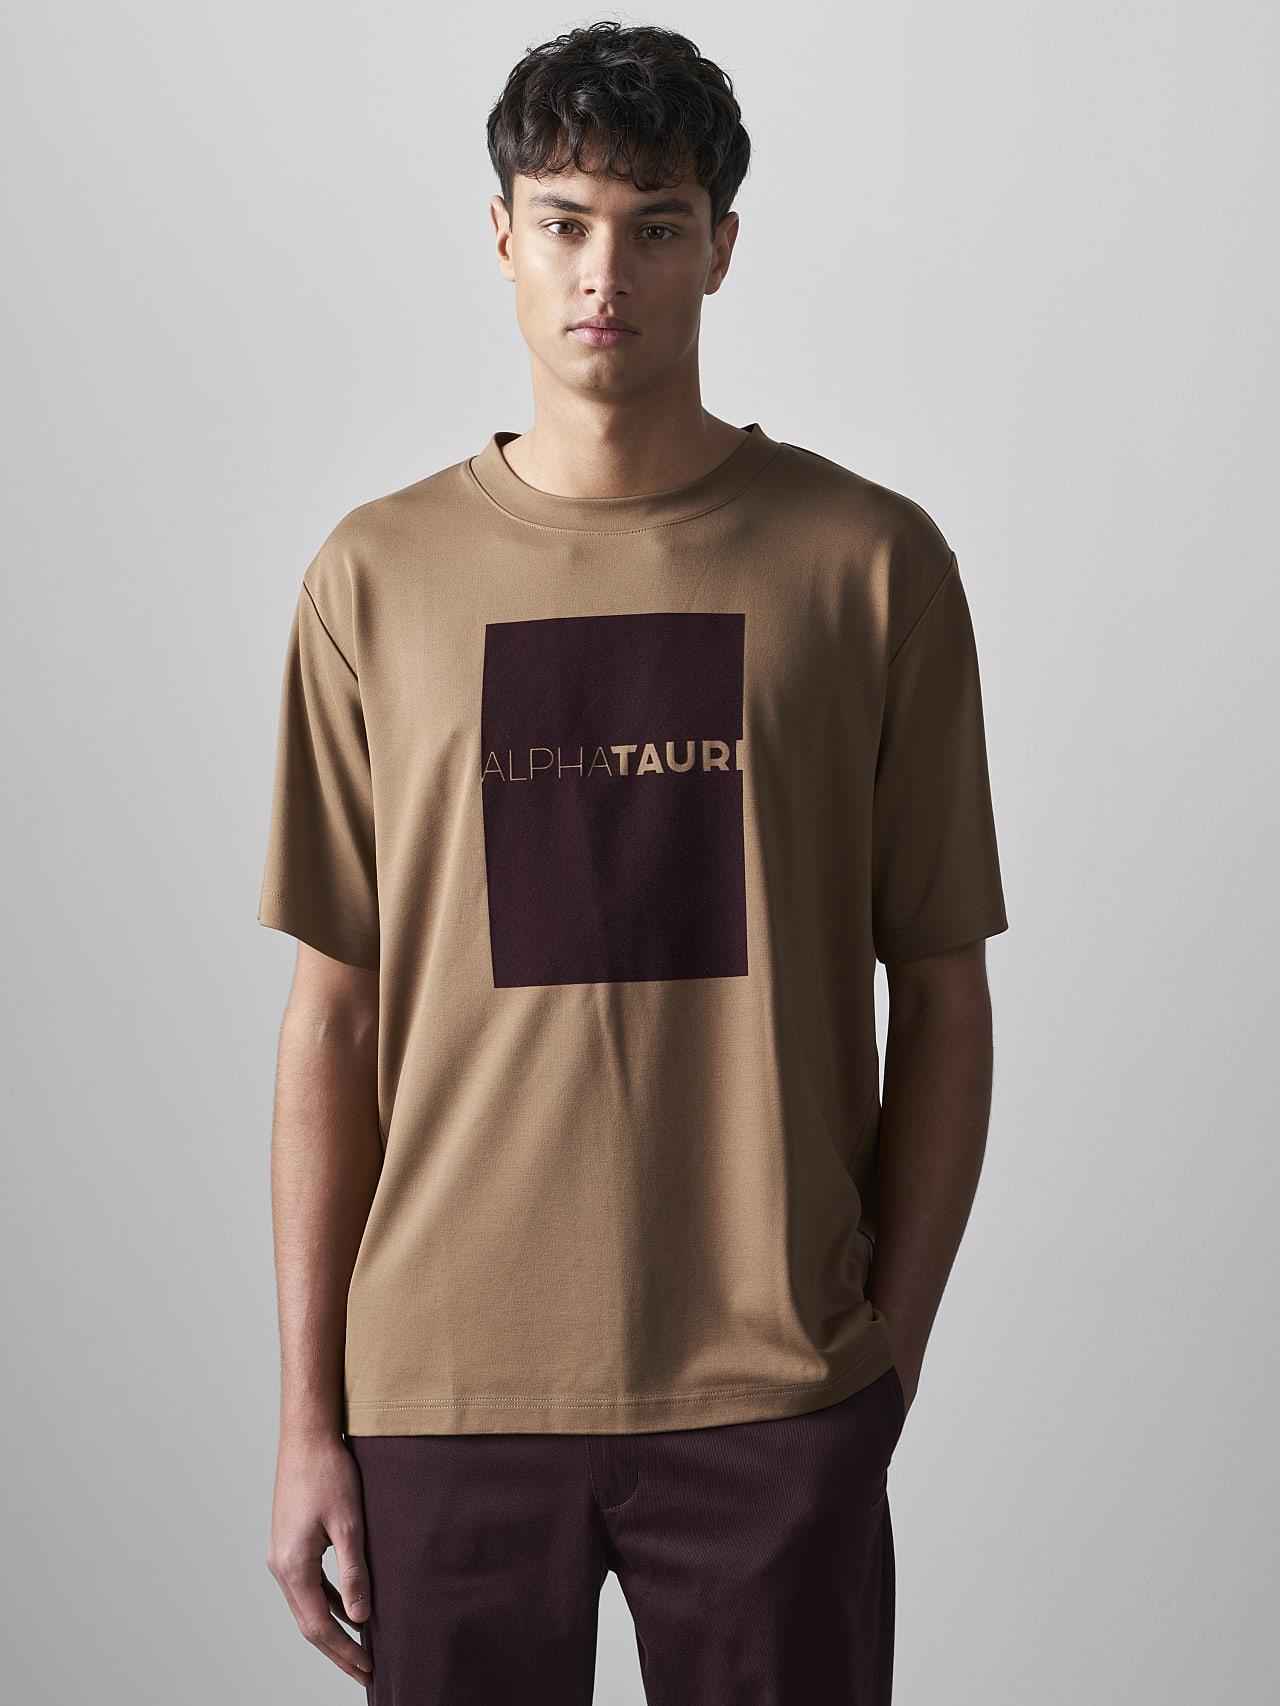 JAHEV V1.Y5.02 Relaxed Logo T-Shirt gold Model shot Alpha Tauri